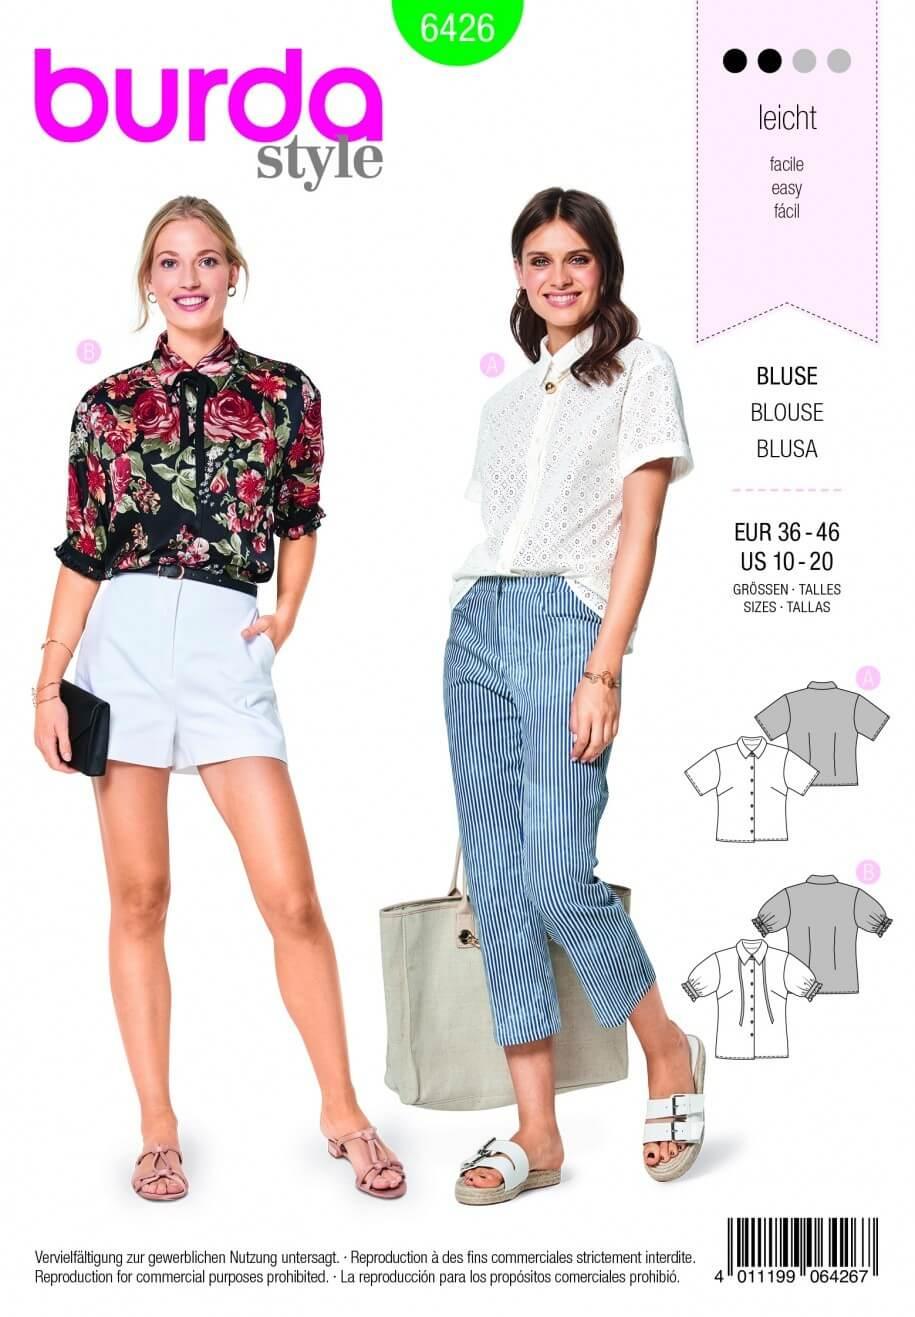 Burda Style Summer Shirt Top Blouse Fabric Sewing Pattern 6426